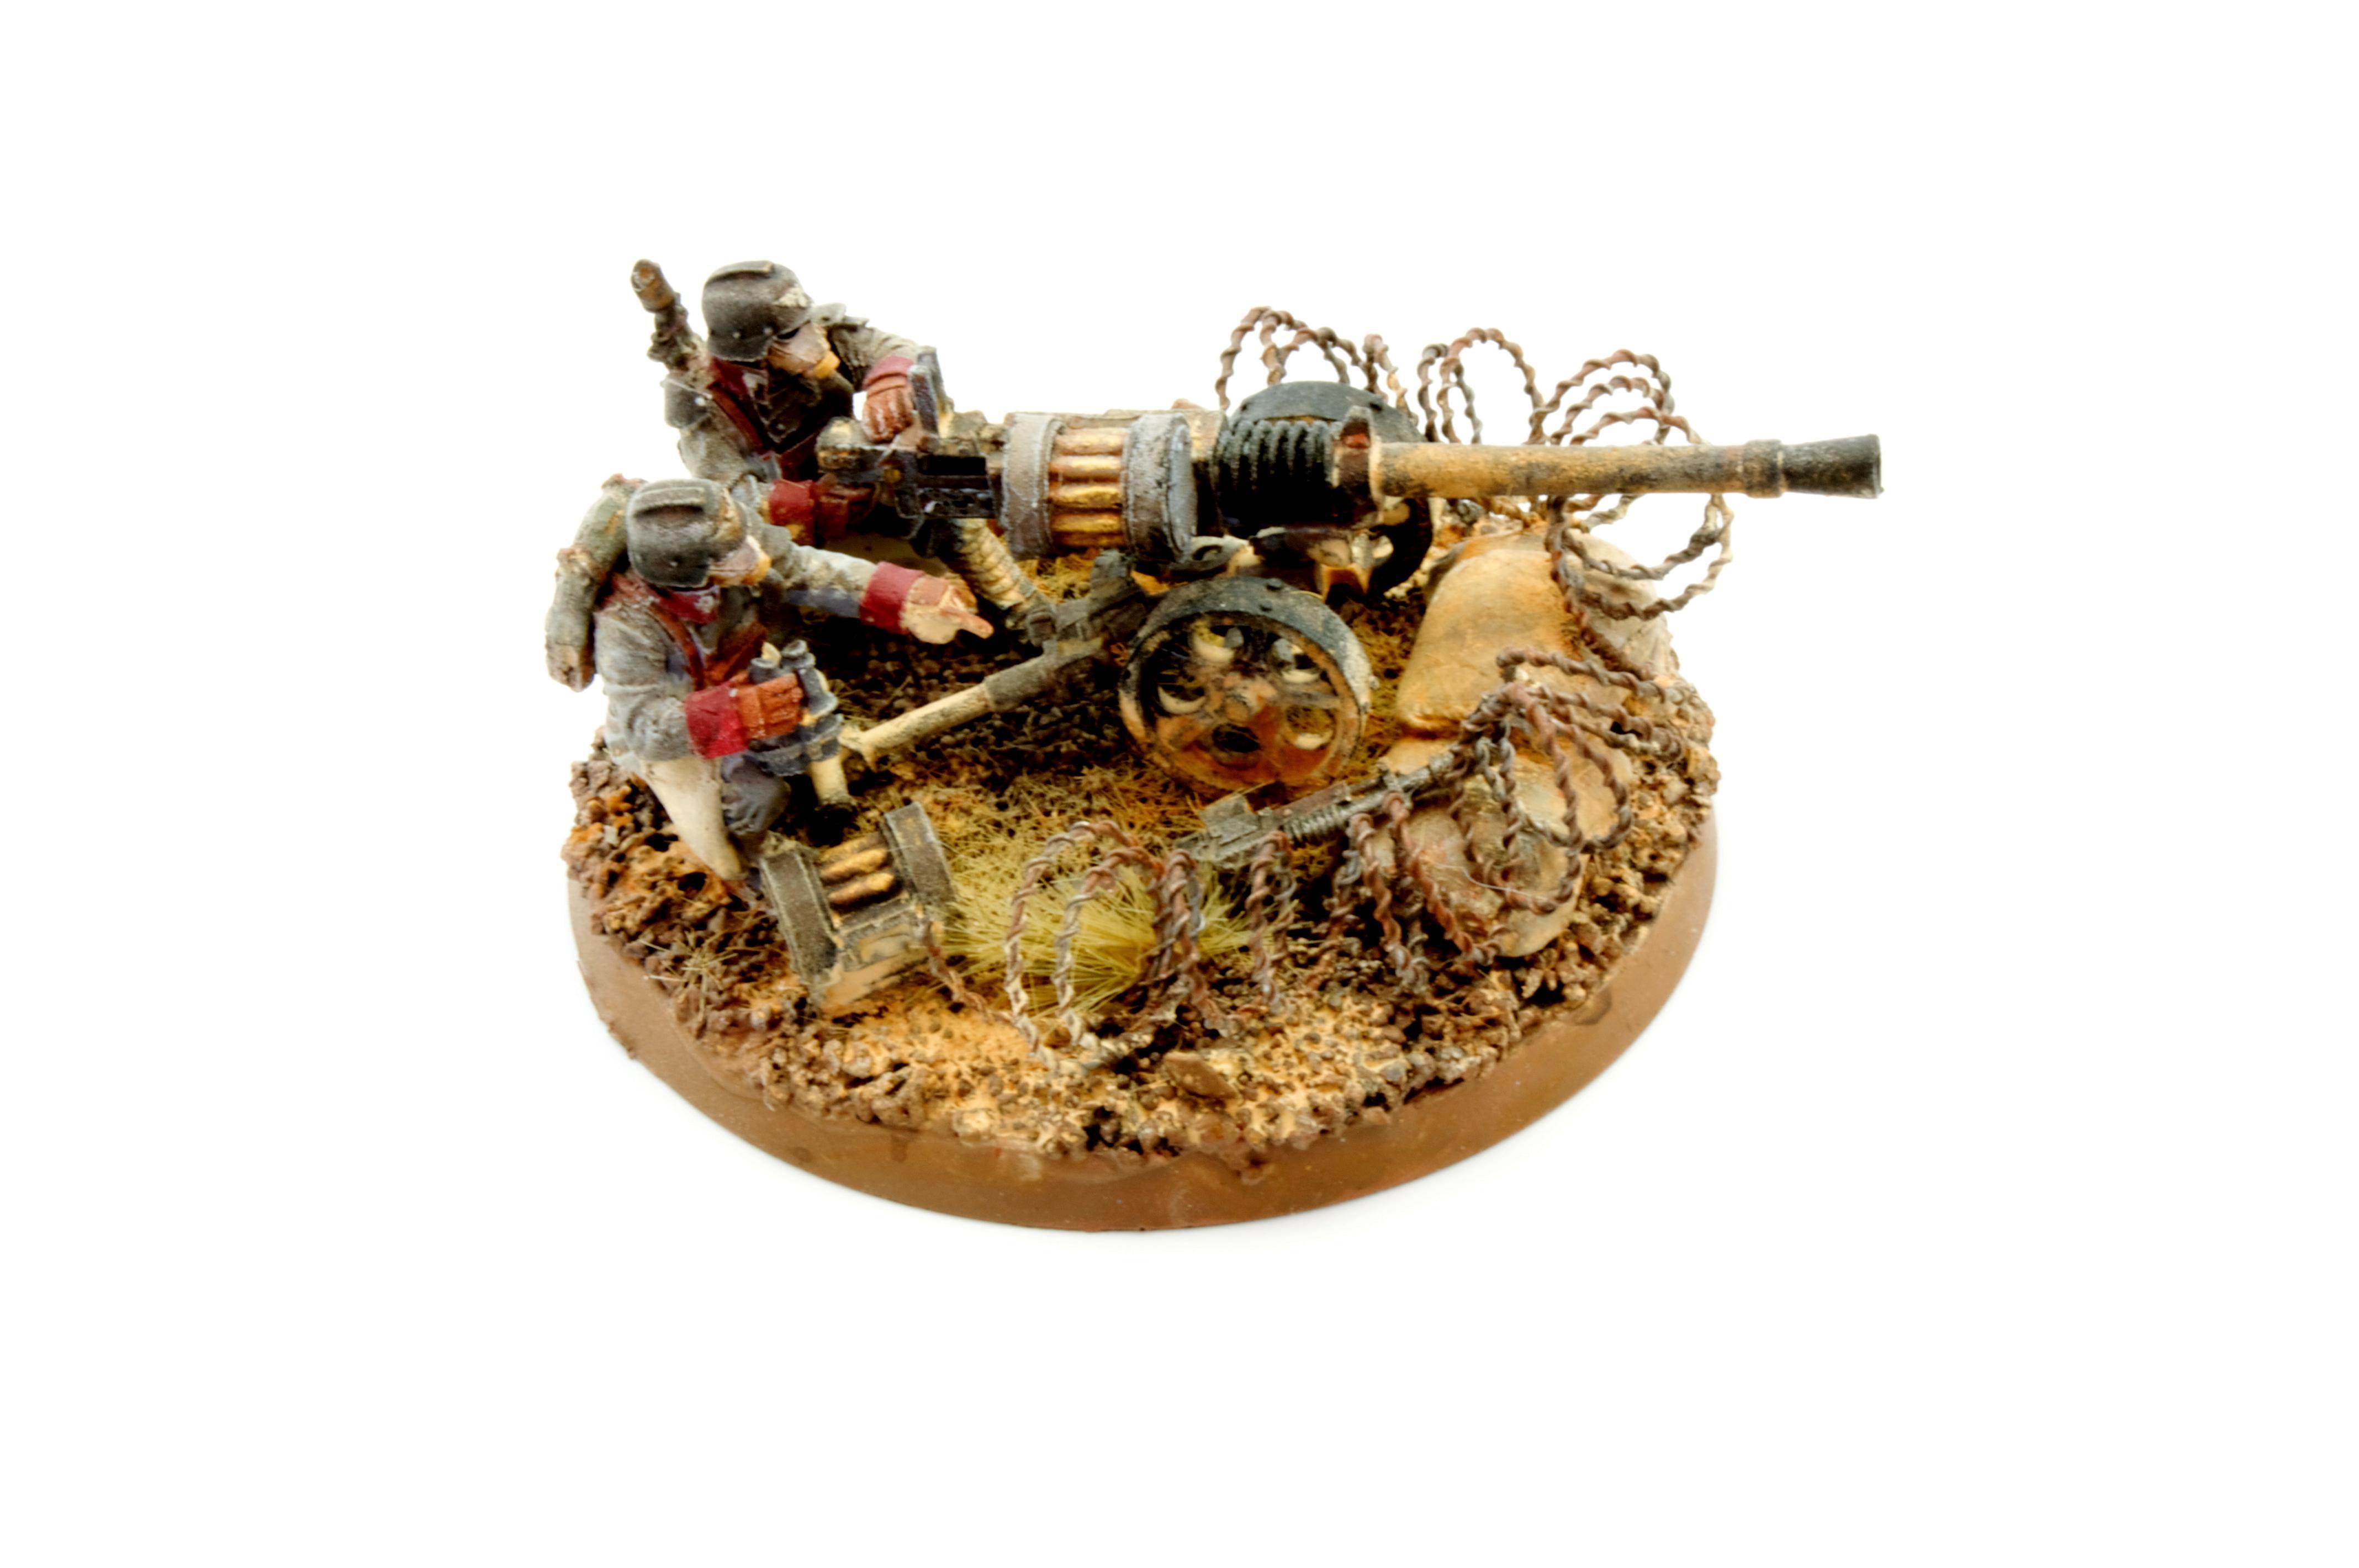 Autocannon, Death Korps of Krieg, Imperial Guard